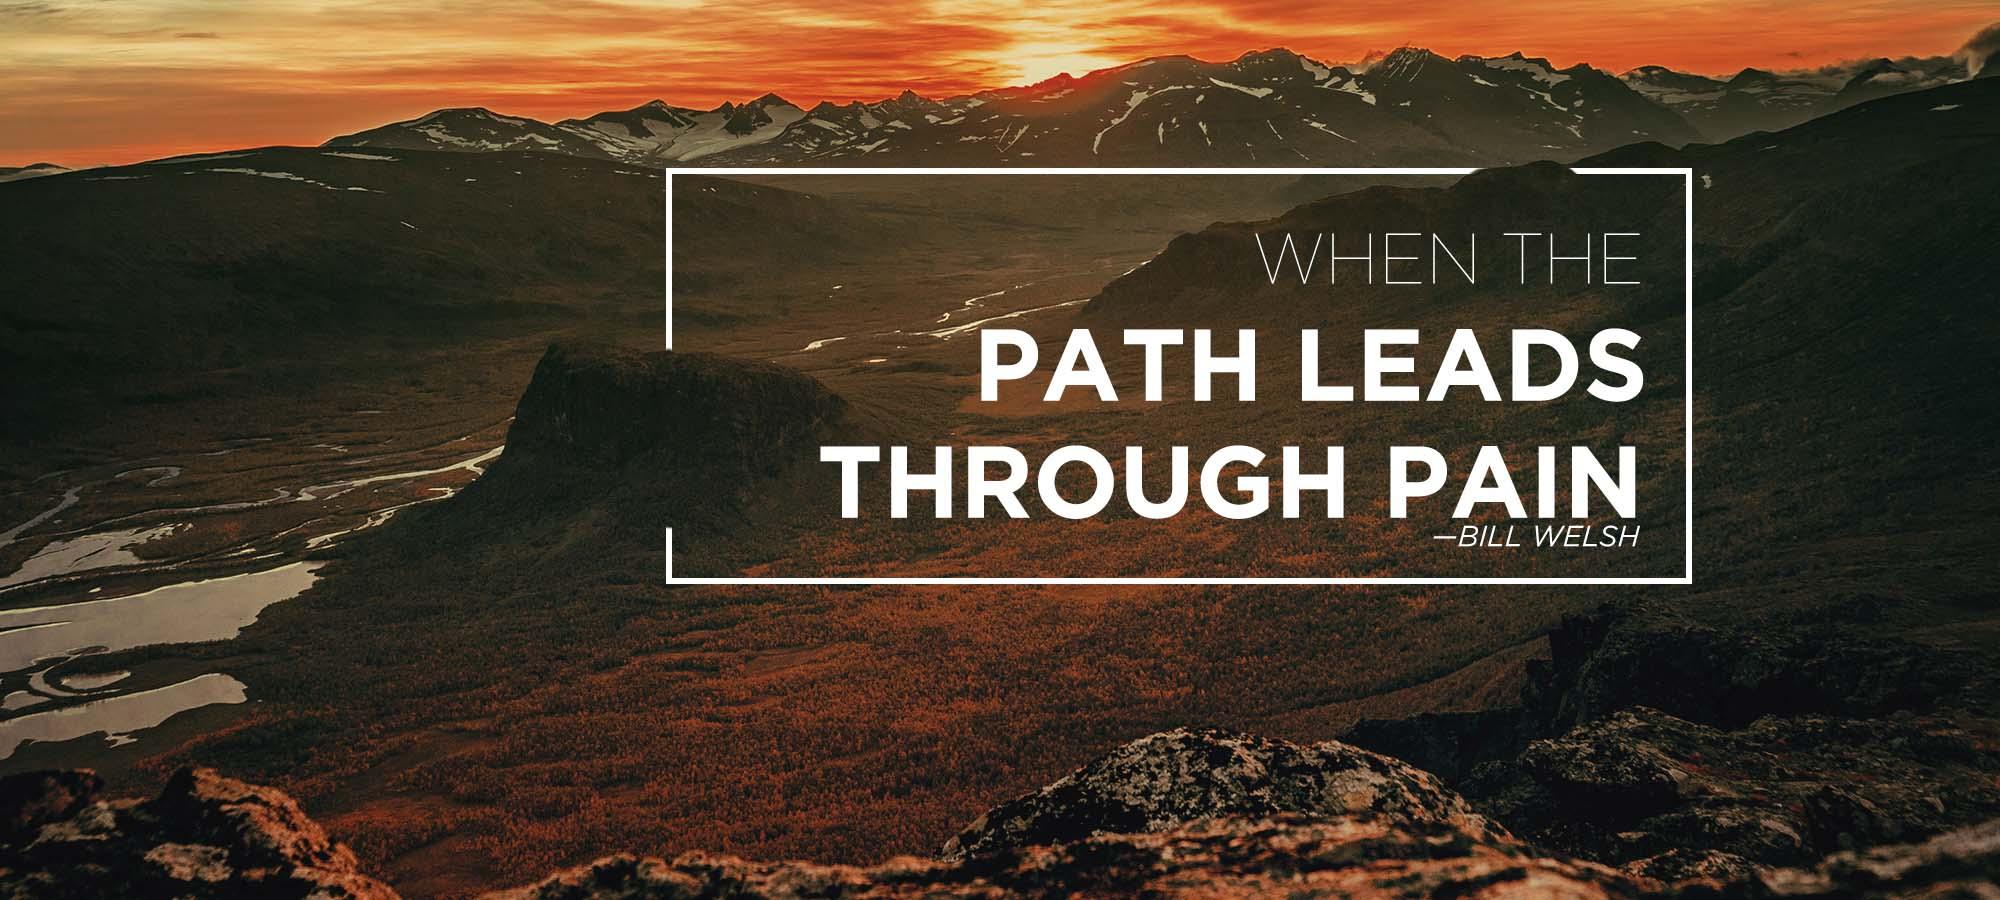 When-The-Path-Leads-Through-Pain-Bill-Welsh.jpg